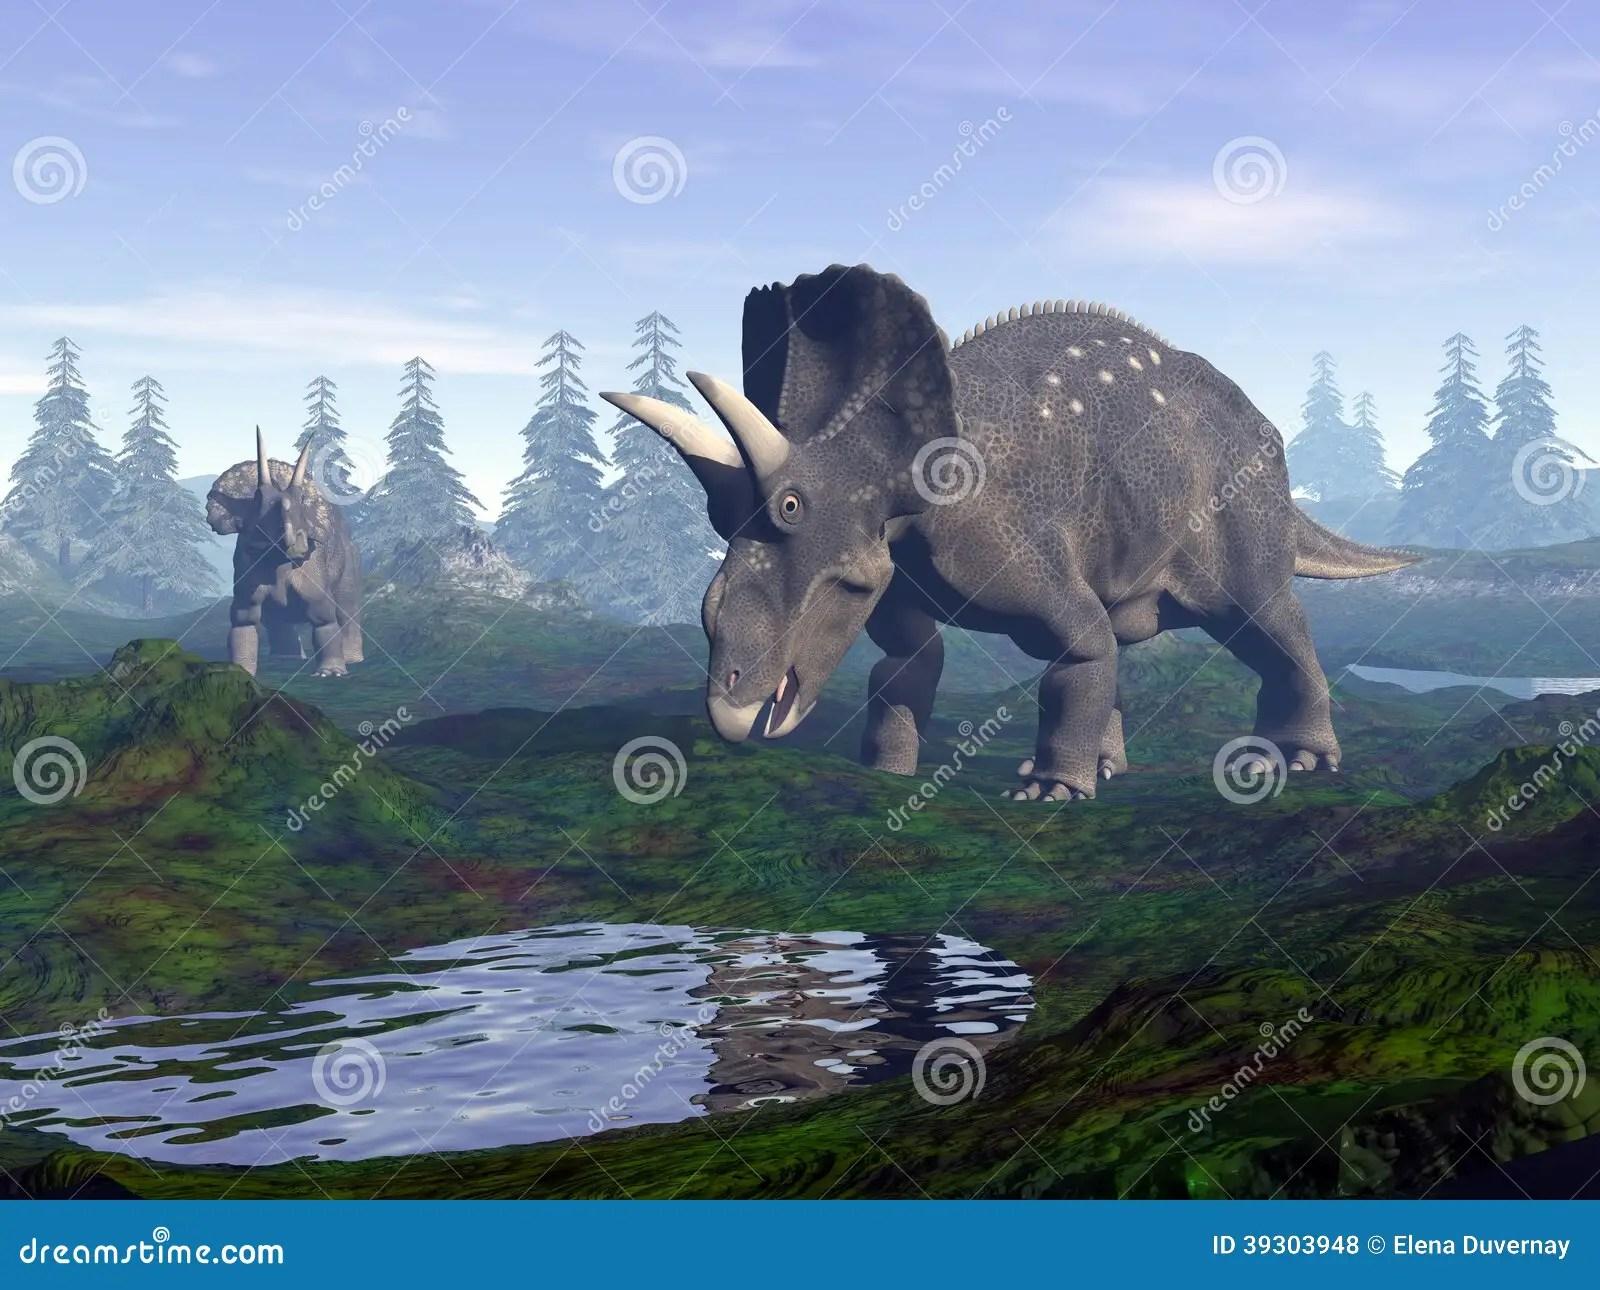 All Dinosaurs Print